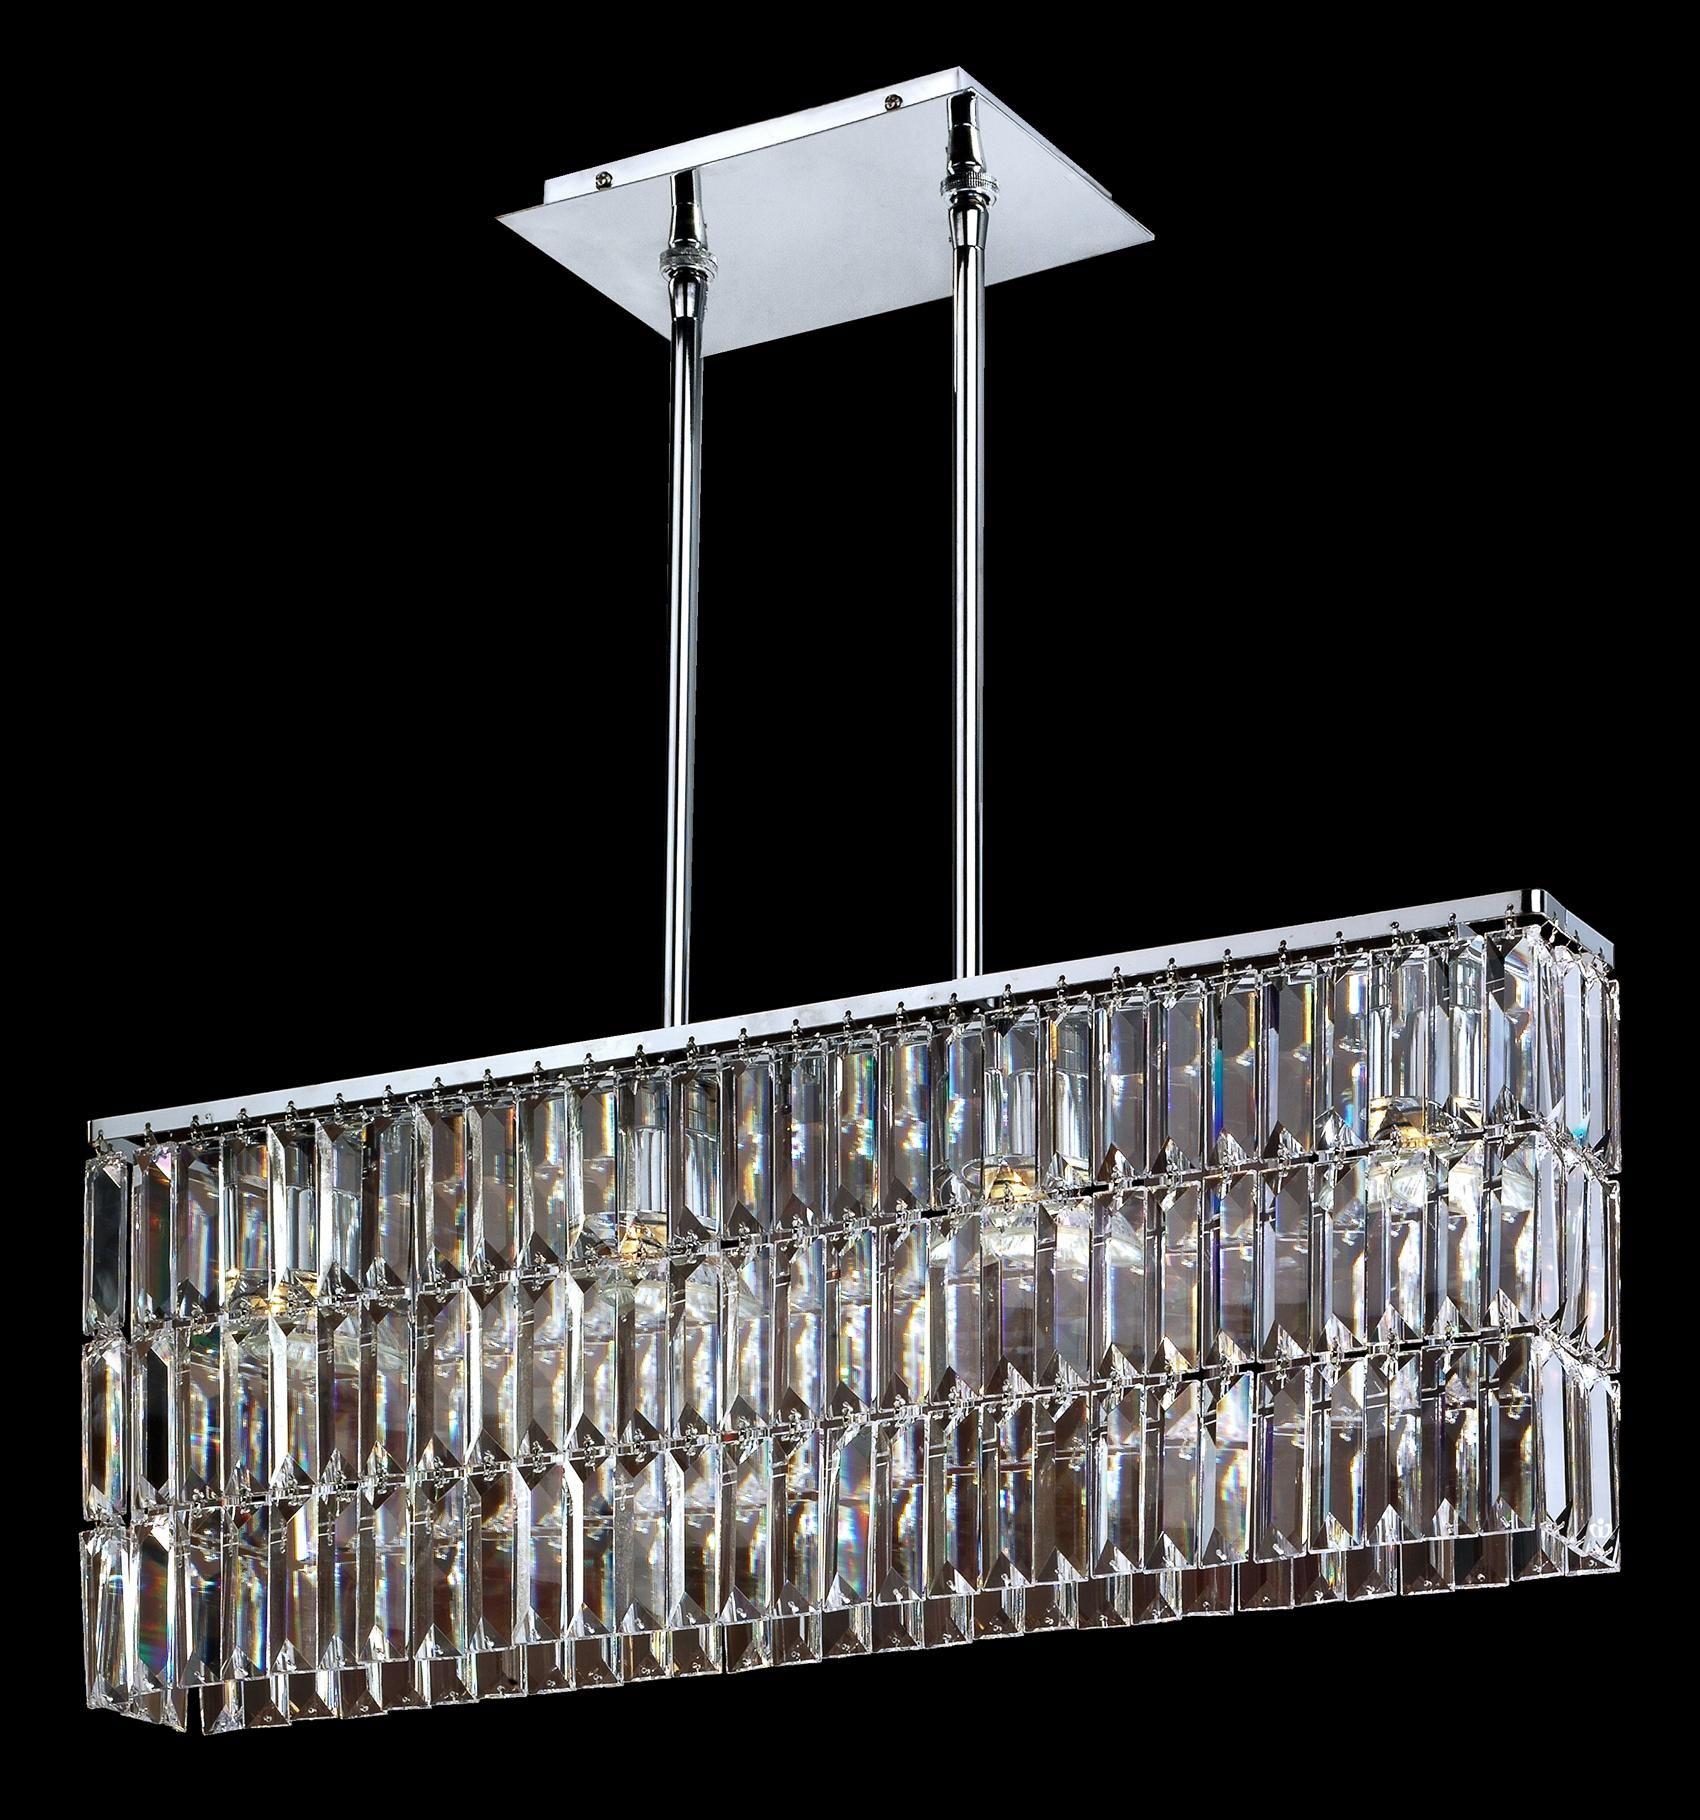 Chrome danube crystal 24 wide pendant chandelier pendant chrome danube crystal 24 wide pendant chandelier arubaitofo Gallery